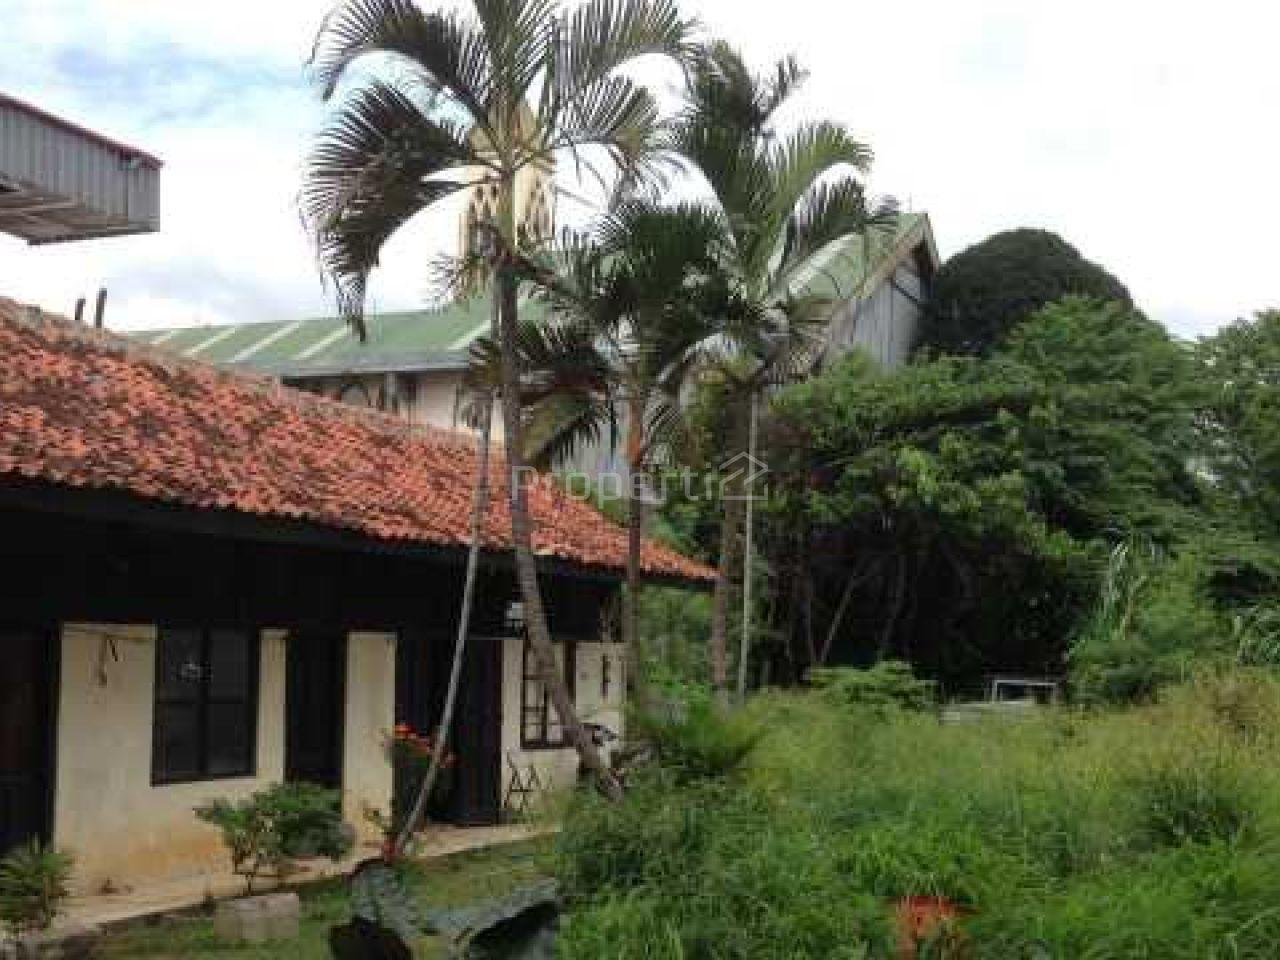 Tanah di Tengah Permukiman Sekitar Jatinegara, DKI Jakarta